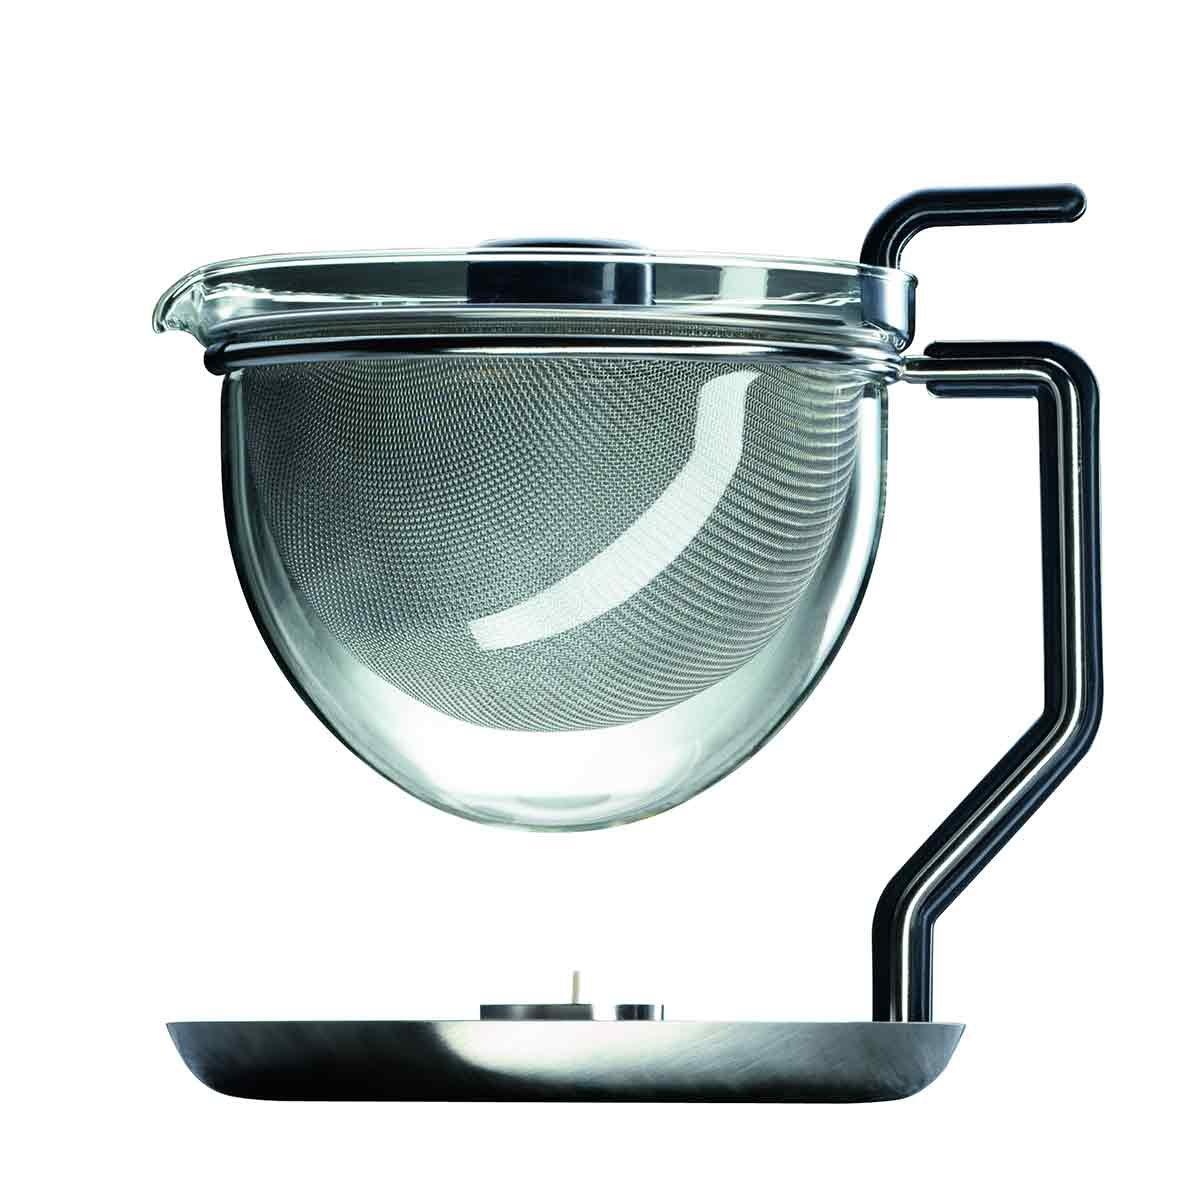 mono 10400 Mono Classic Teapot with Integrated Warmer by Tassilo von Grolman